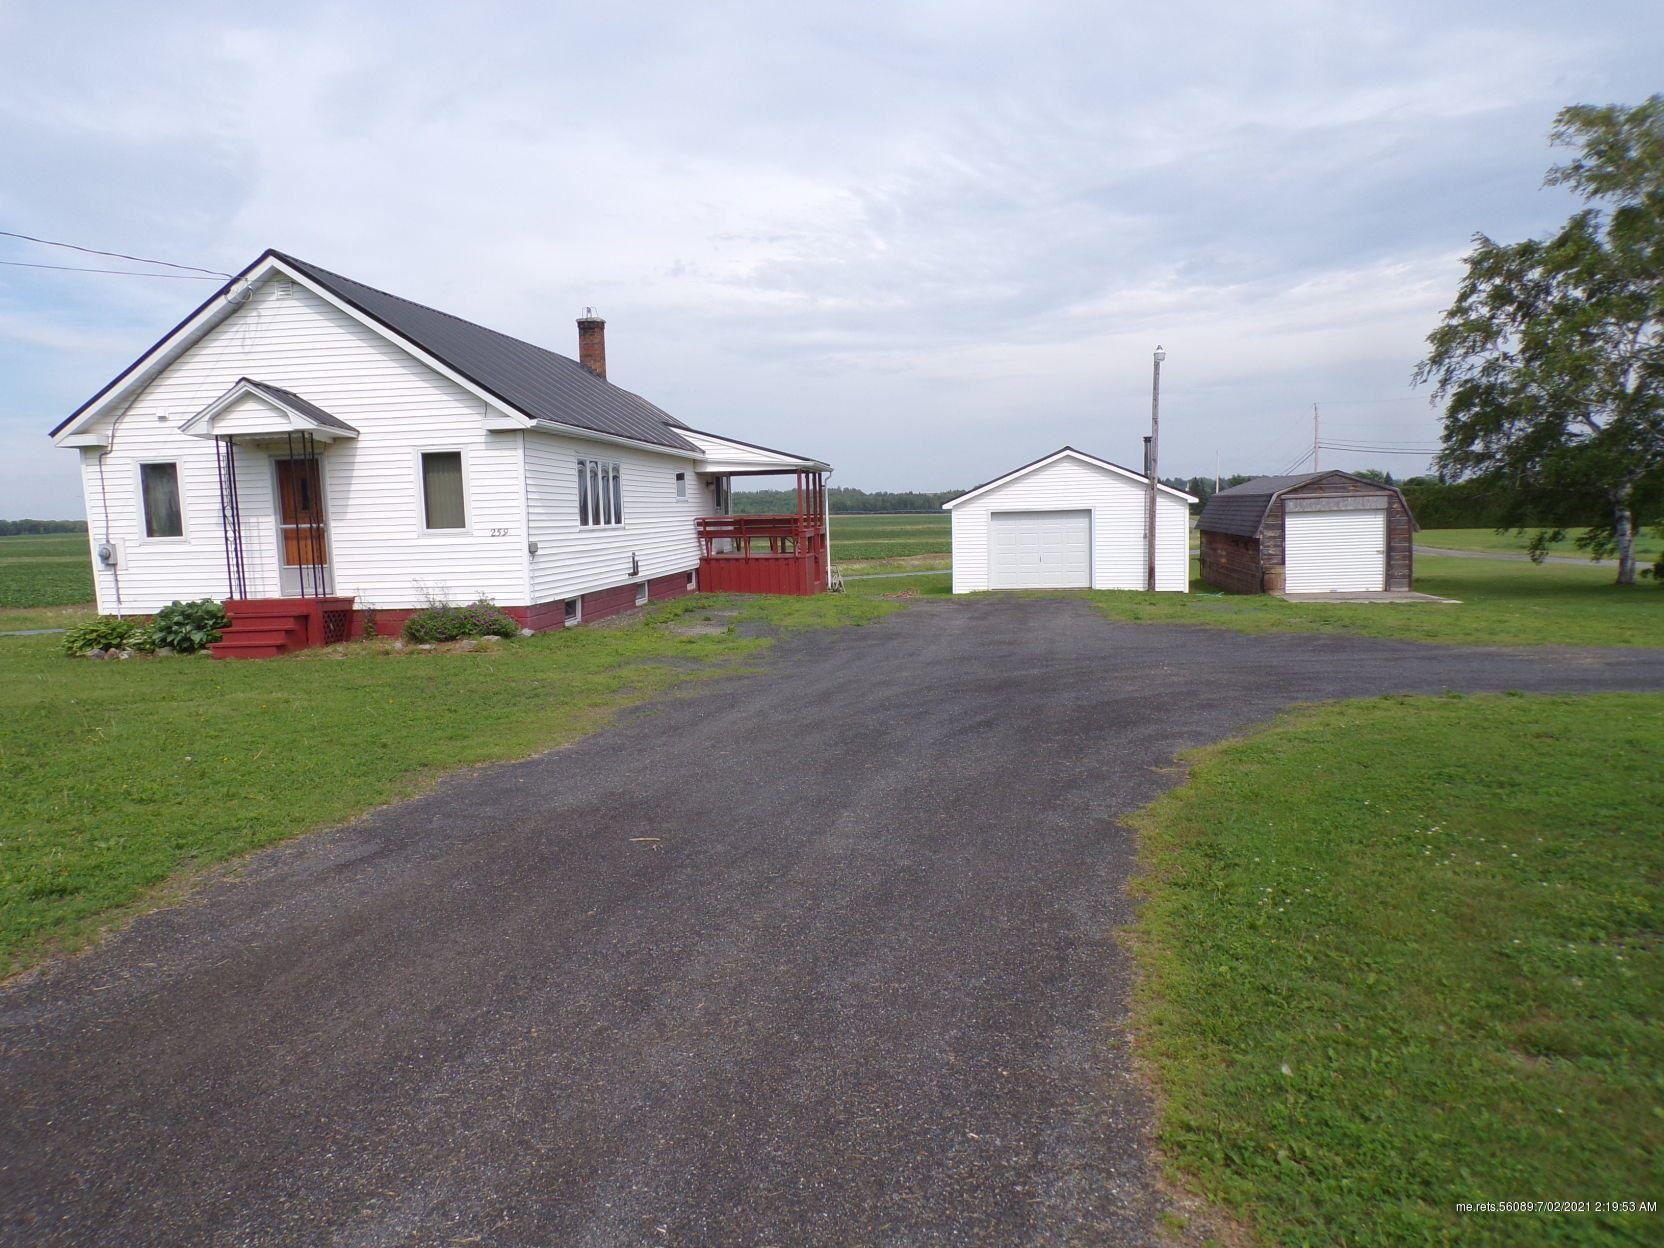 Photo of 259 Centerline Road, Presque Isle, ME 04769 (MLS # 1498721)